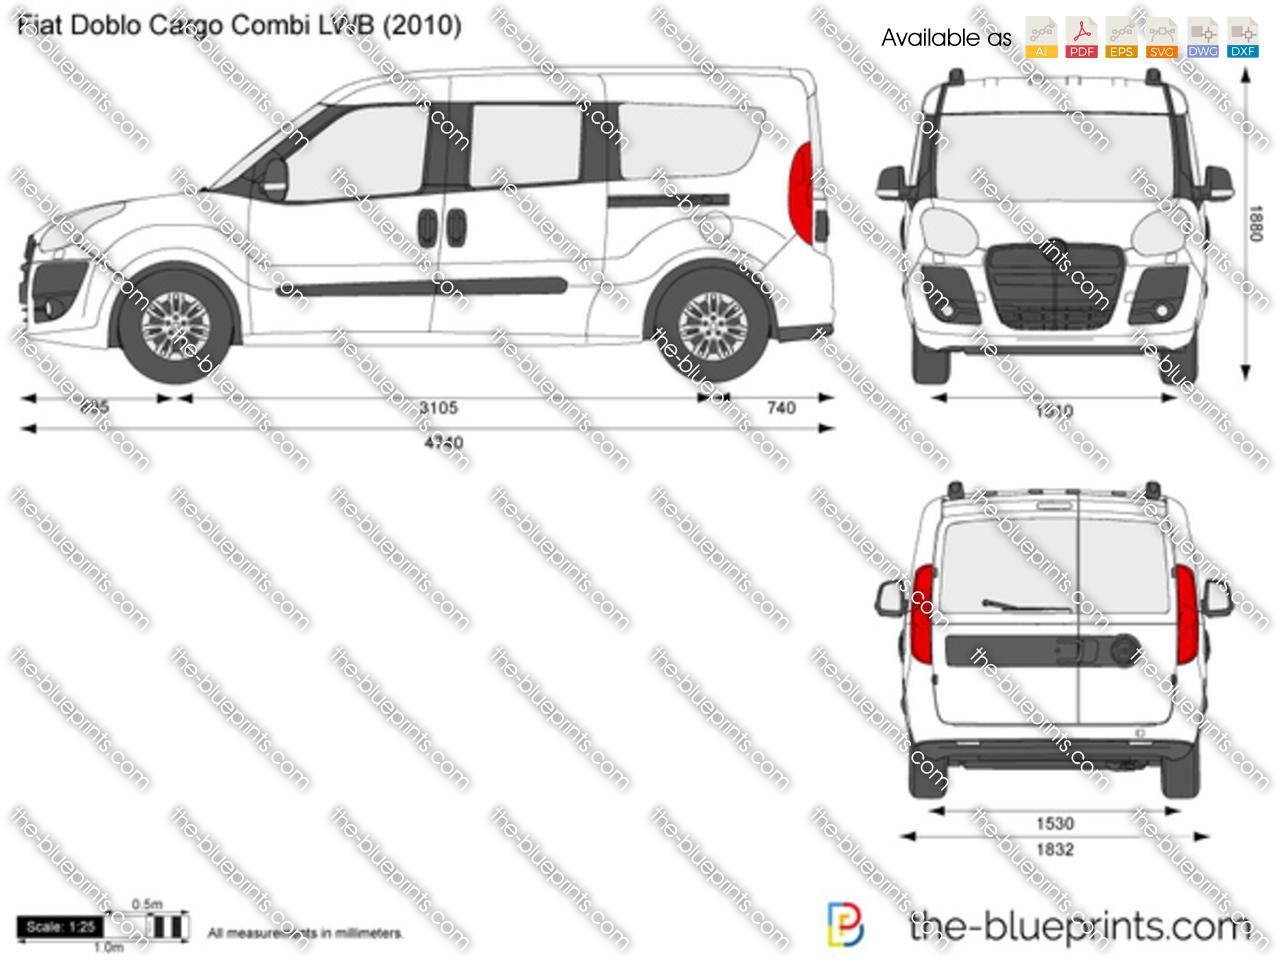 Fiat Doblo Cargo Combi LWB 2013